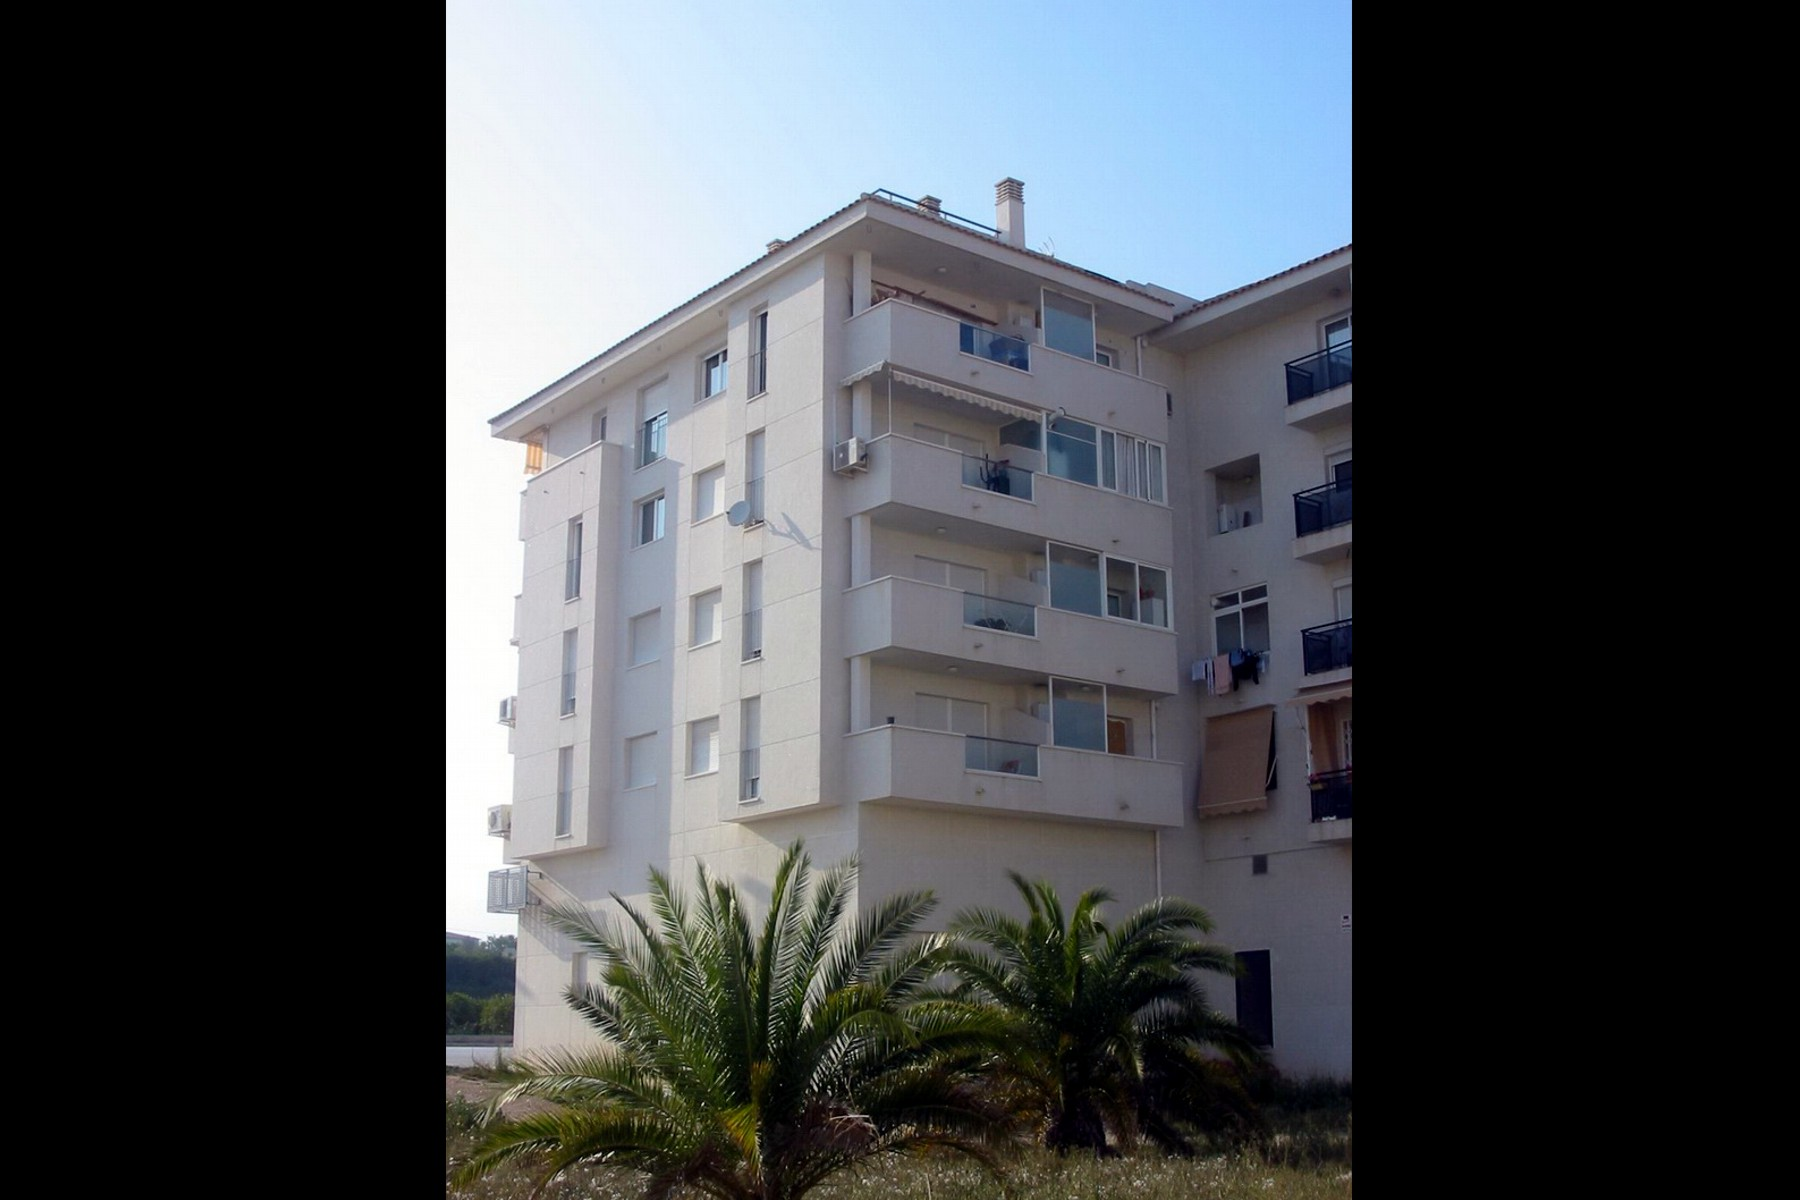 Imaginarq-053-Edificio-Viviendas-Altea-Alicante-11A